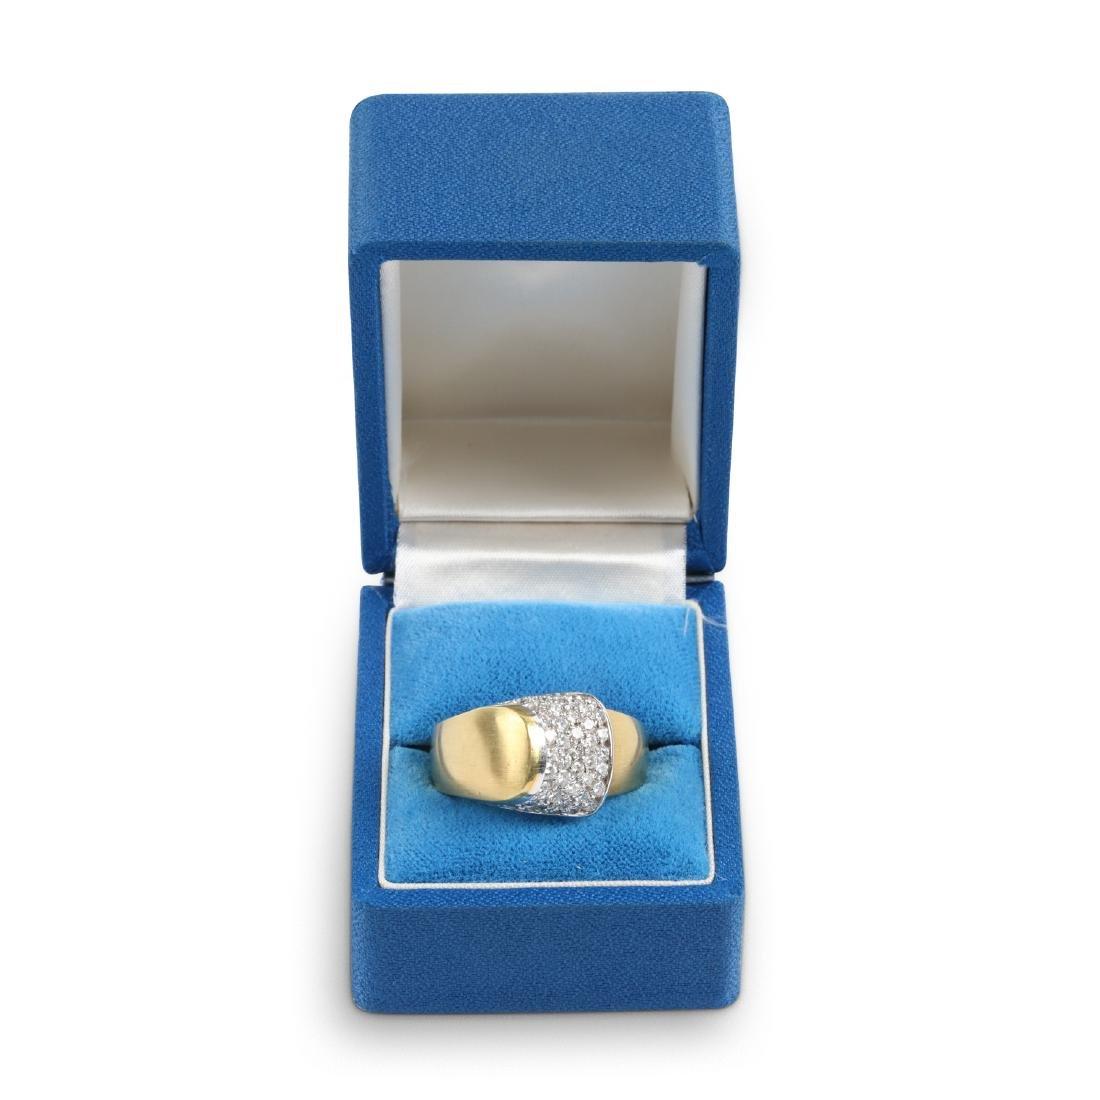 An 18K Gold & Diamond Ring